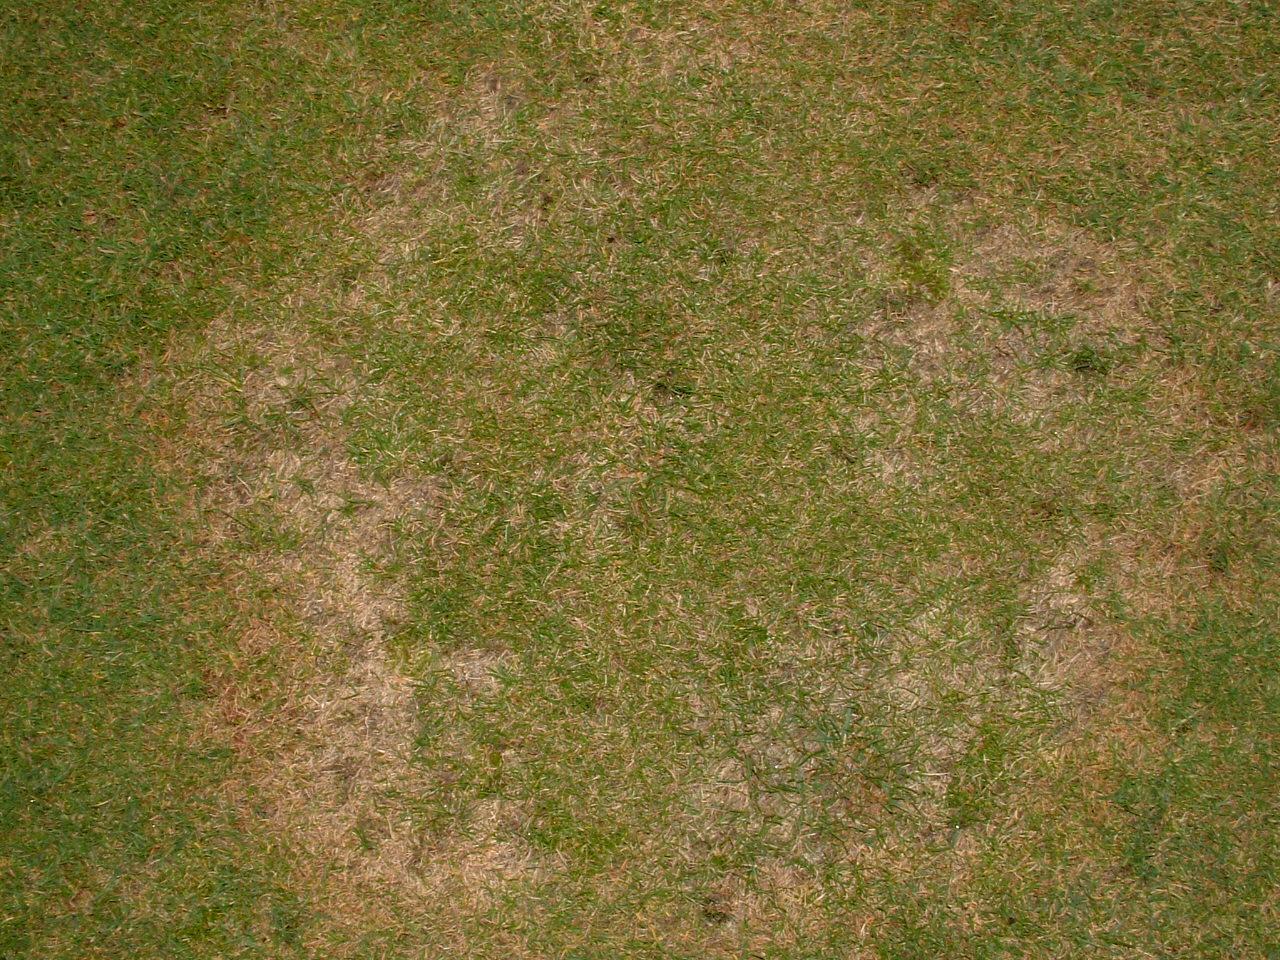 Soil Grass Texture | www.pixshark.com - Images Galleries ...